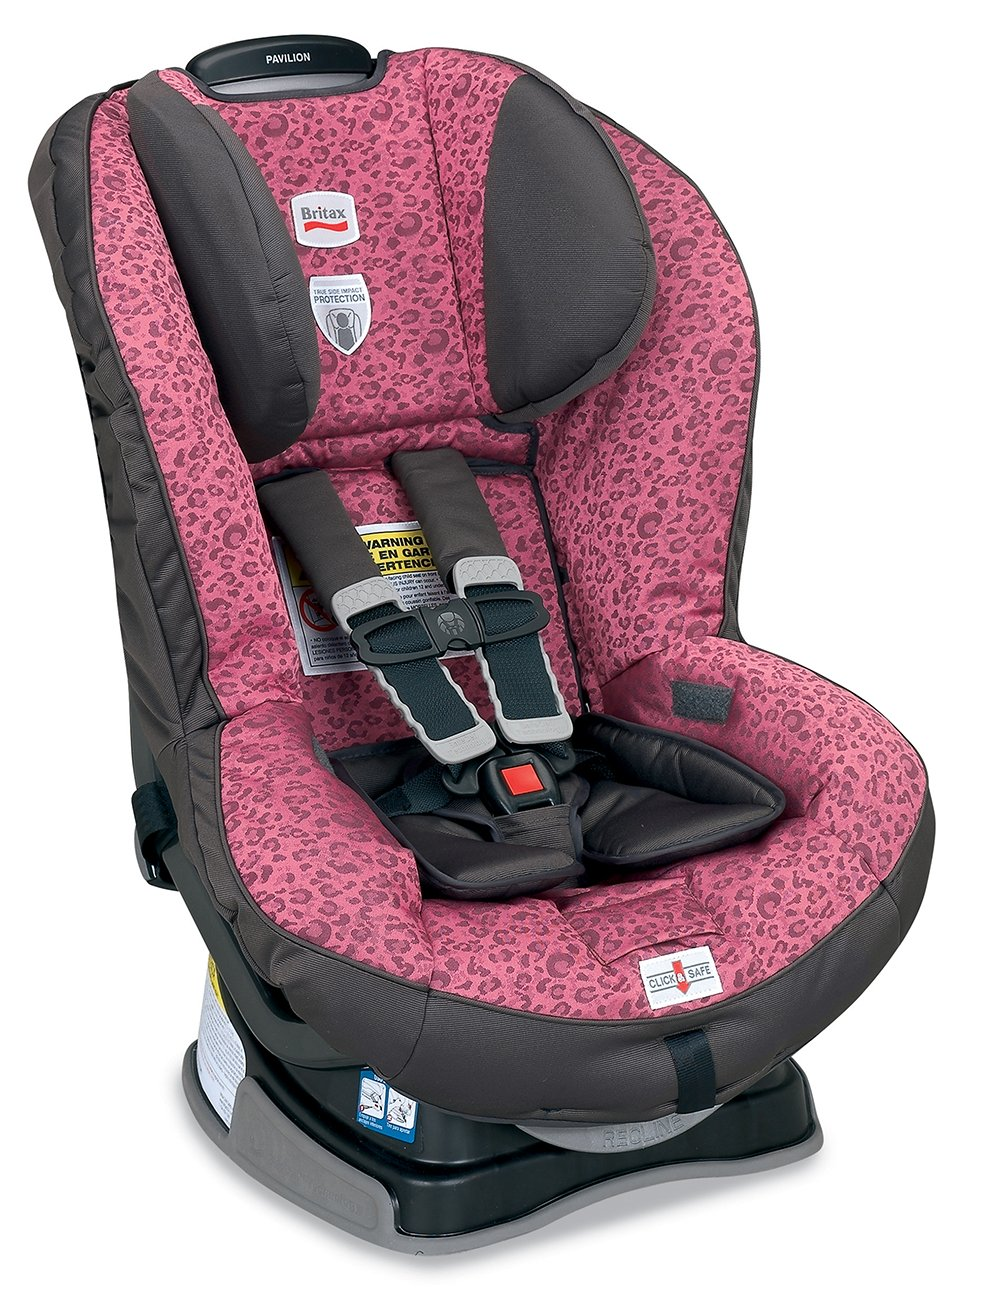 Amazon com britax pavilion g4 convertible car seat cub pink prior model baby